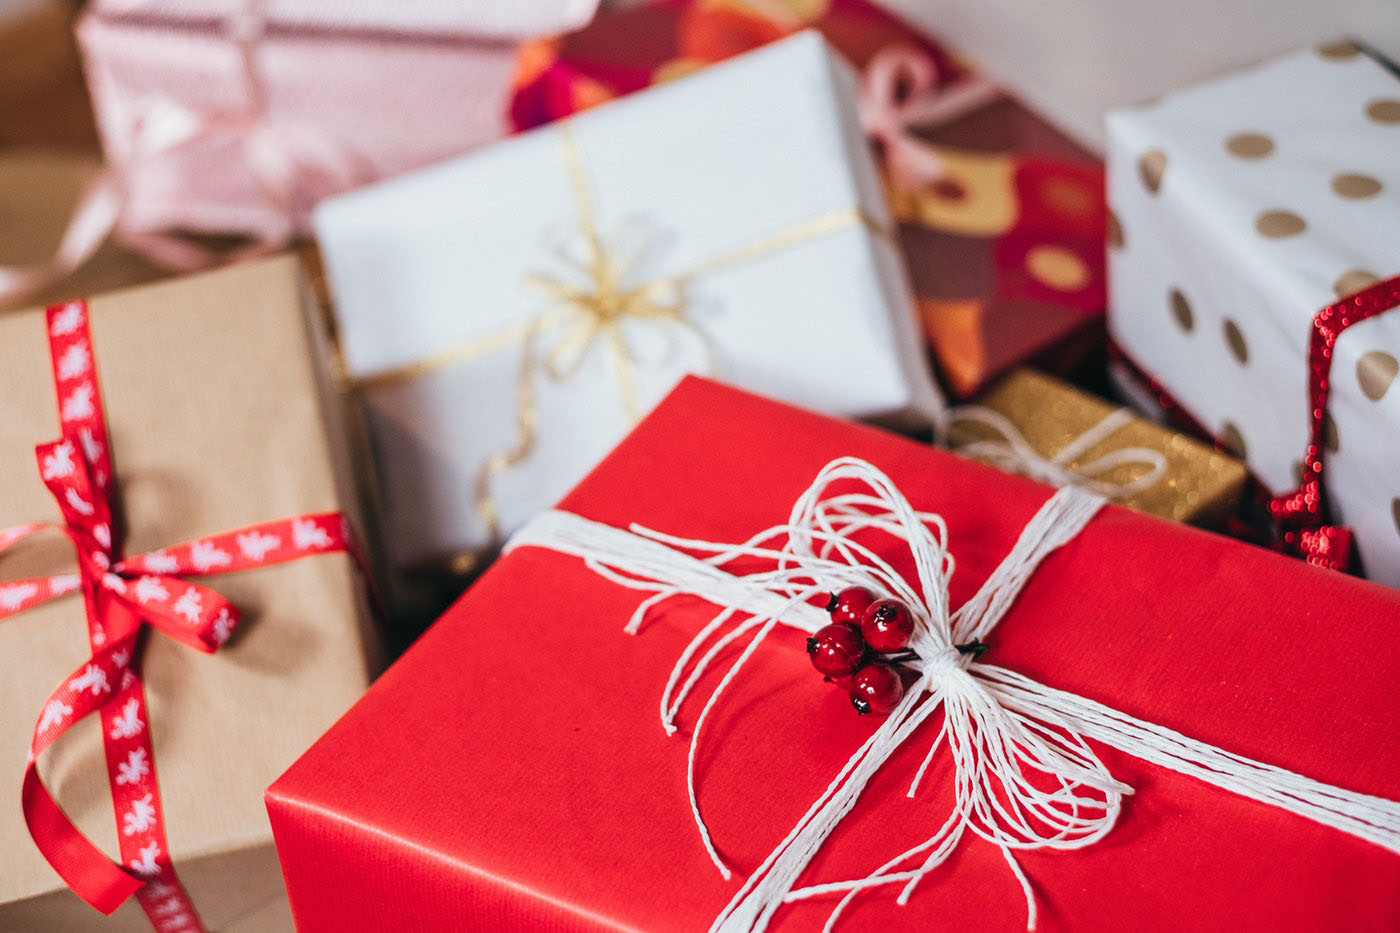 The Best Bitcoin Christmas gift ideas